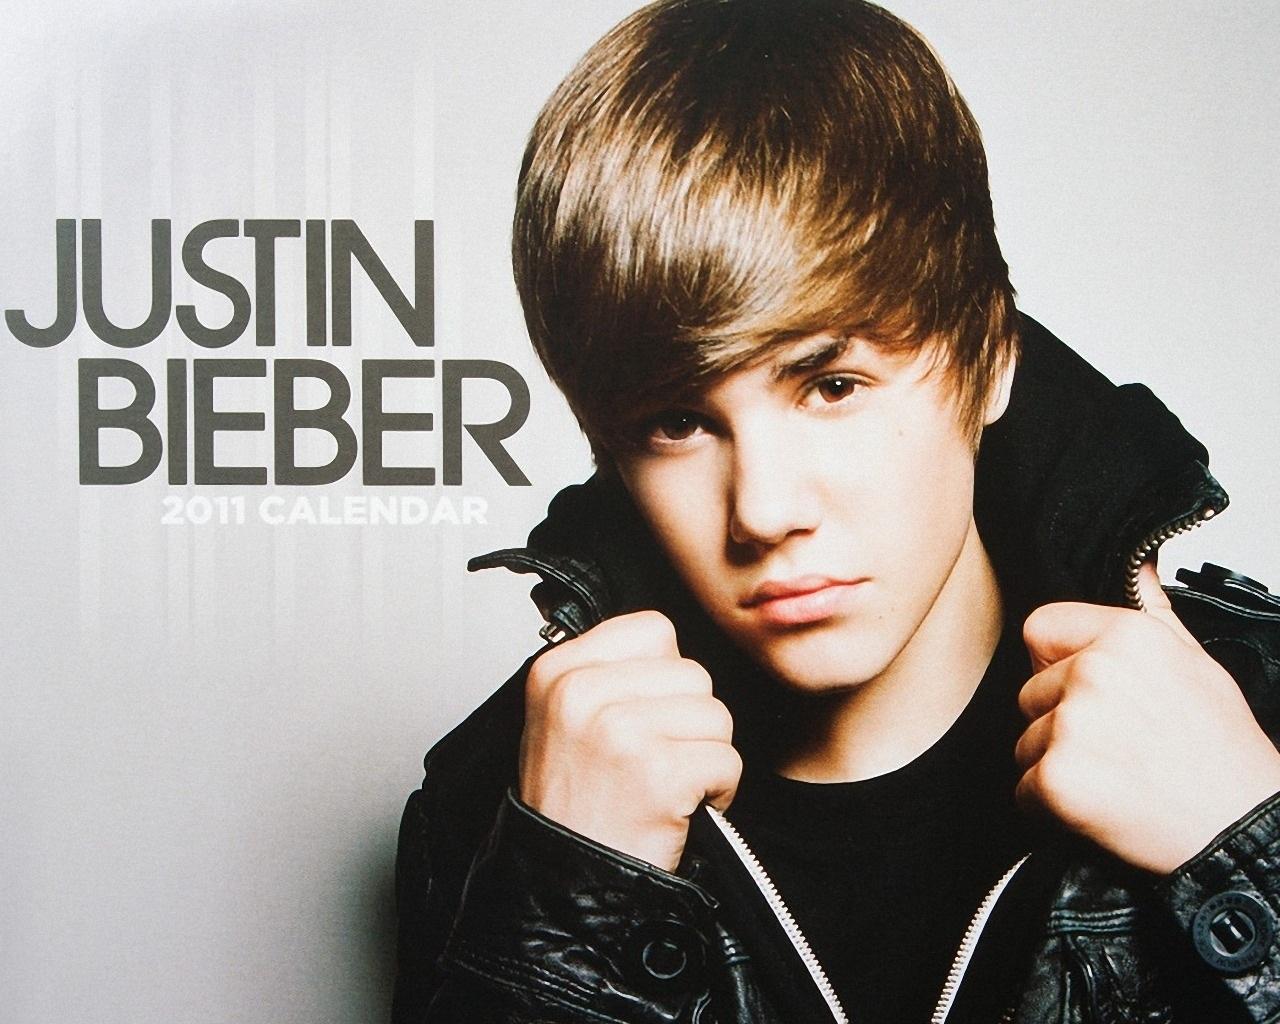 Imagenes De Justin Bieber - QyGjxZ